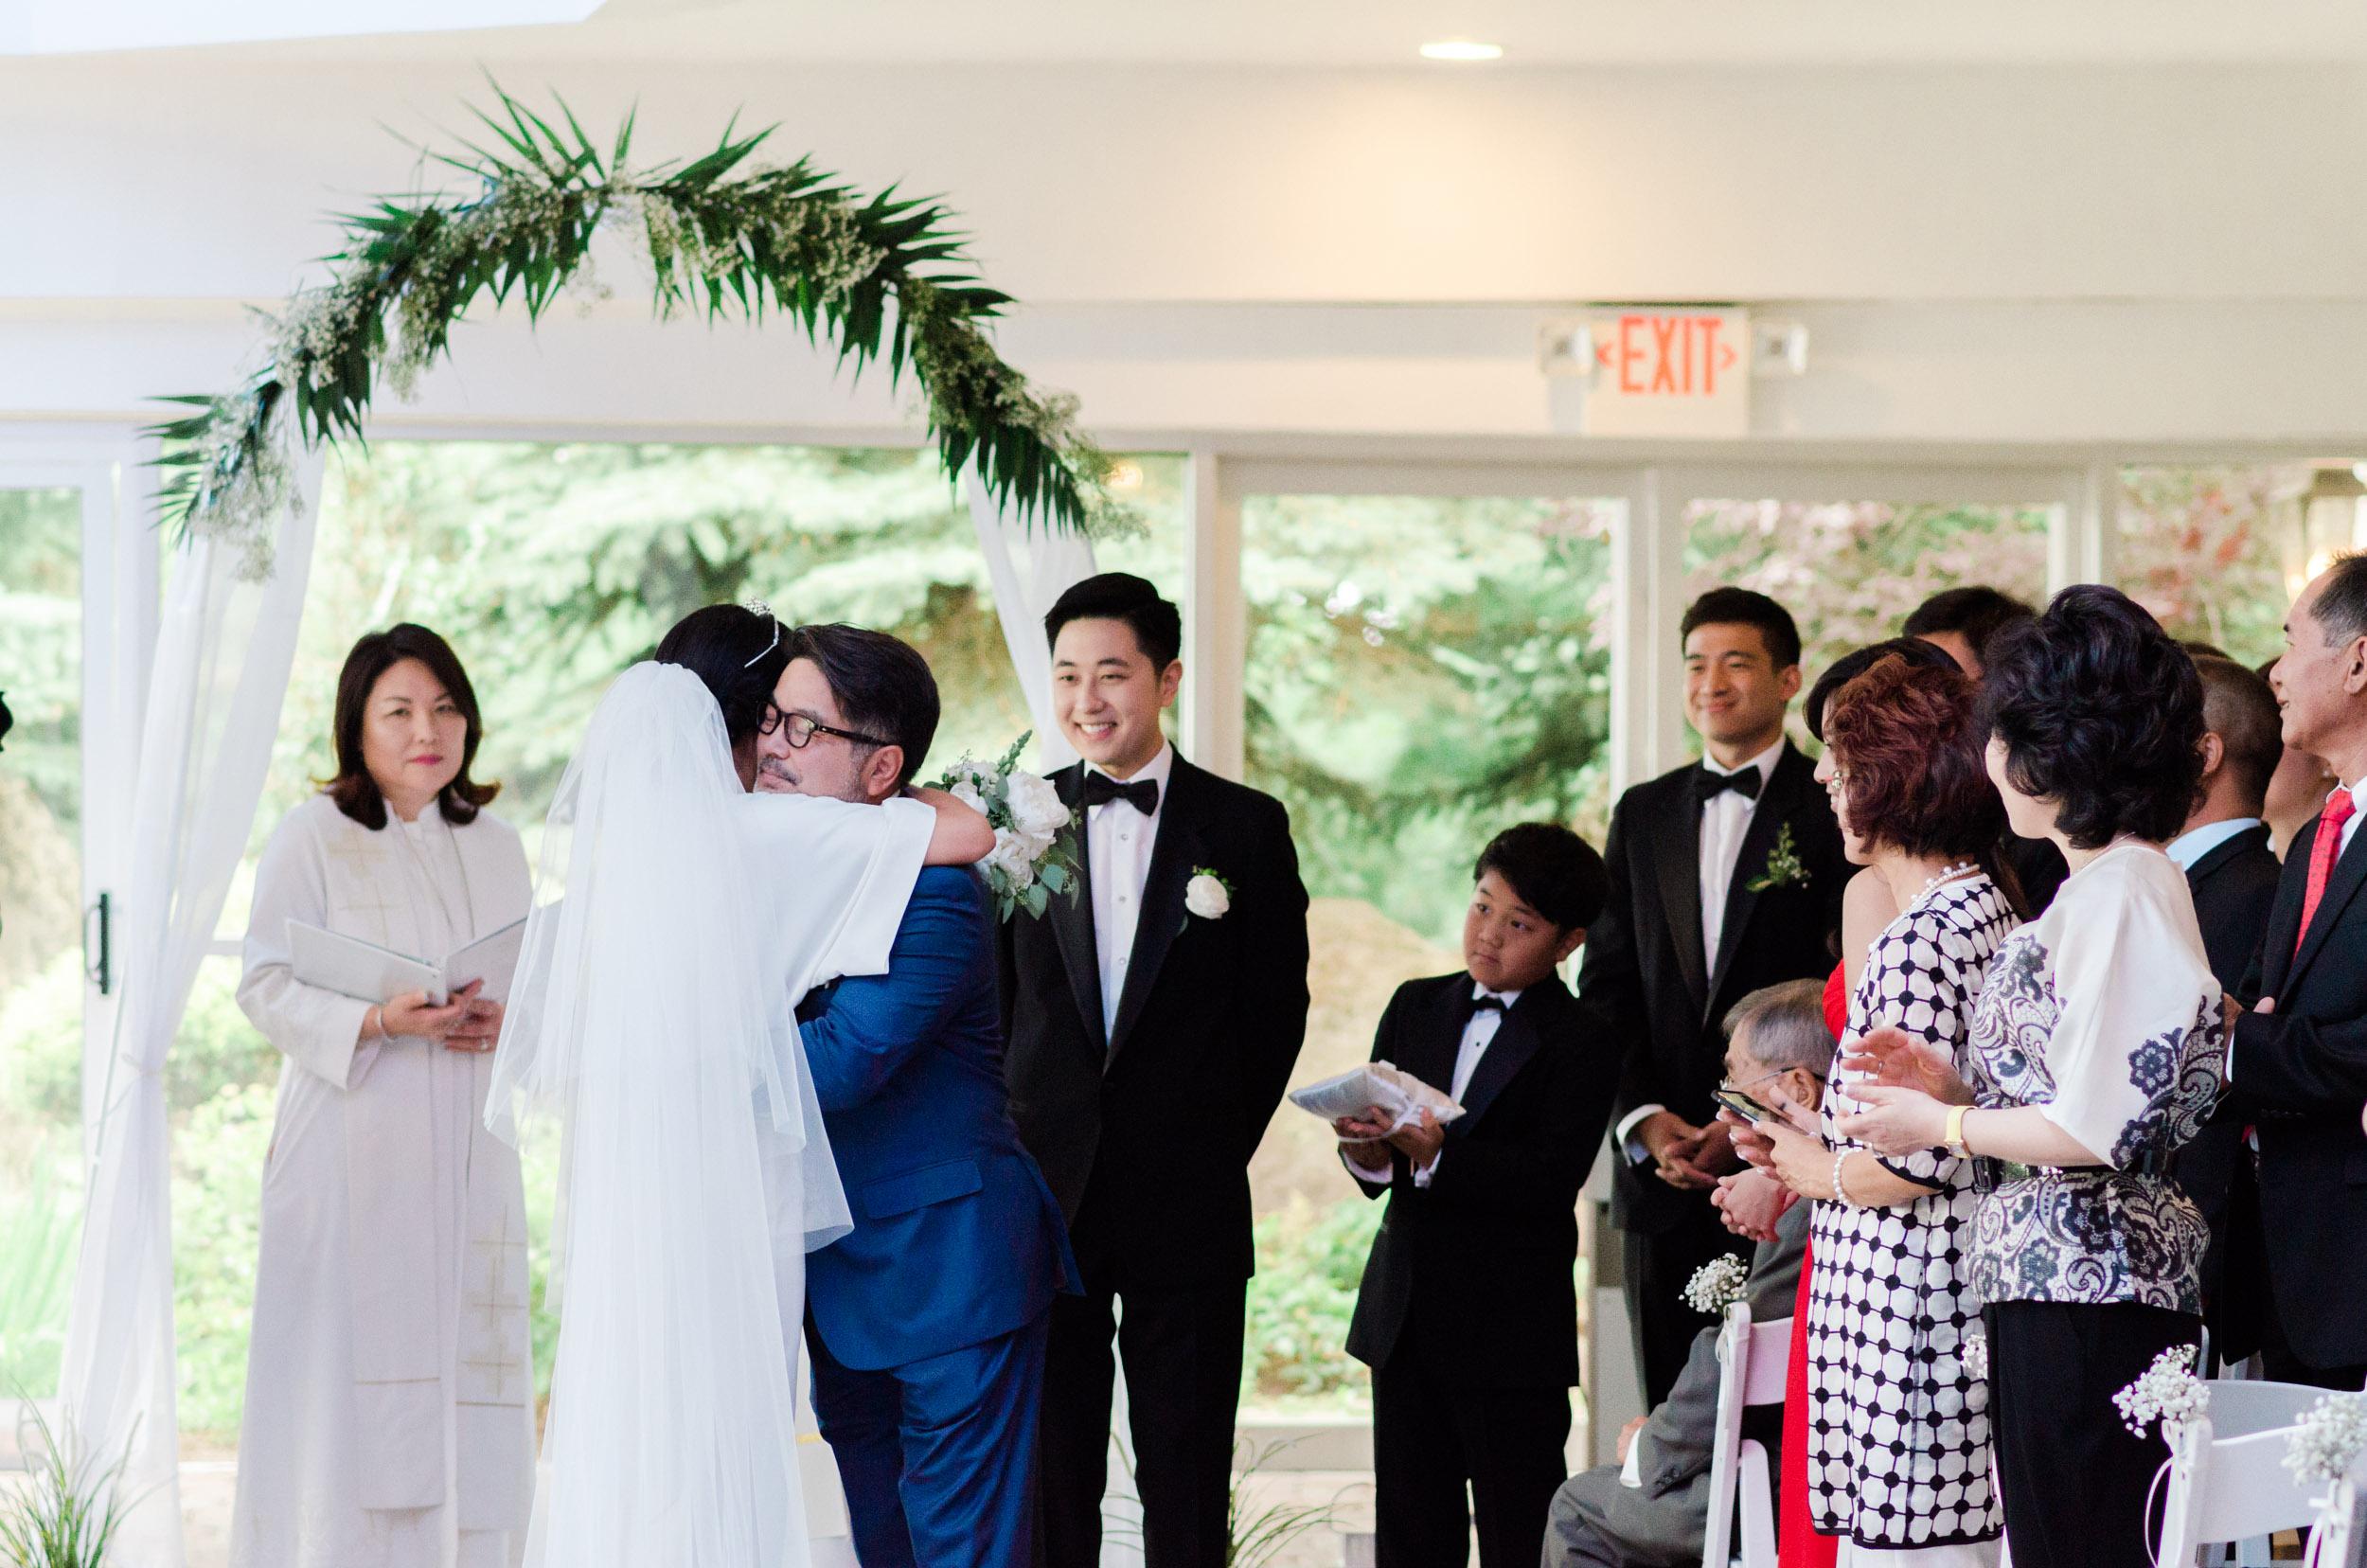 jean-arnold-wedding-0023.jpg